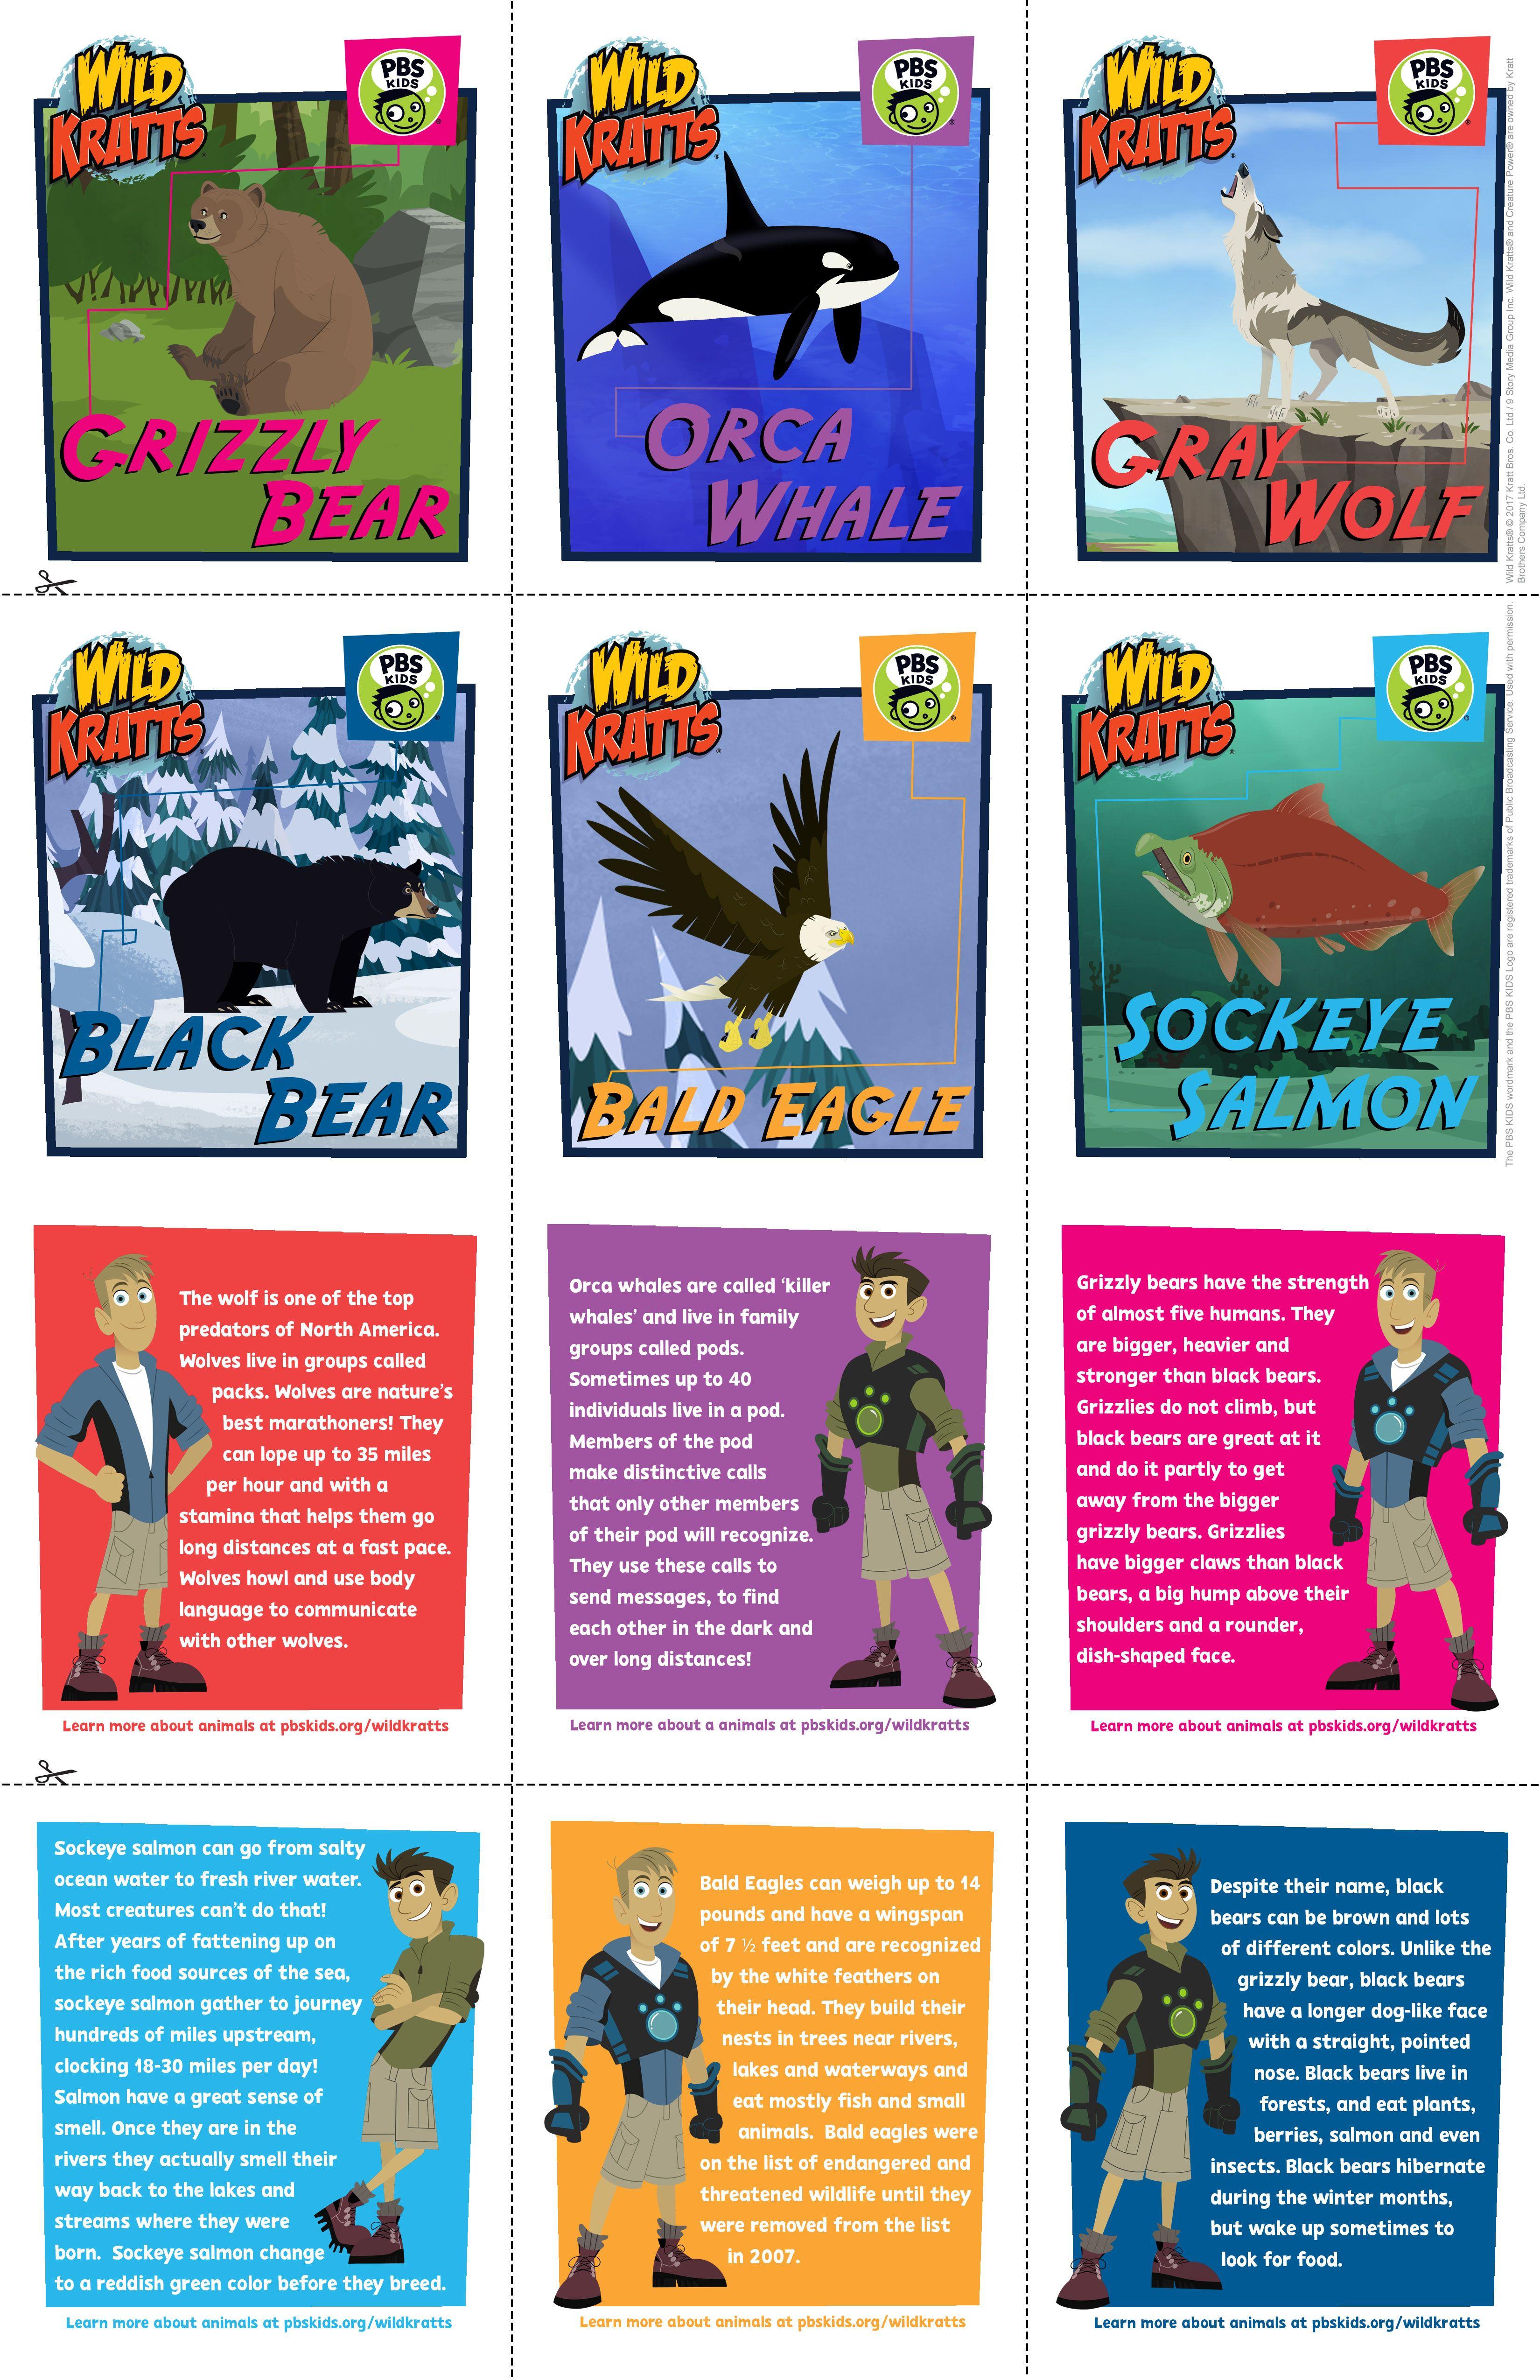 Wild Kratts Wild Alaska Hero S Journey Trading Cards To